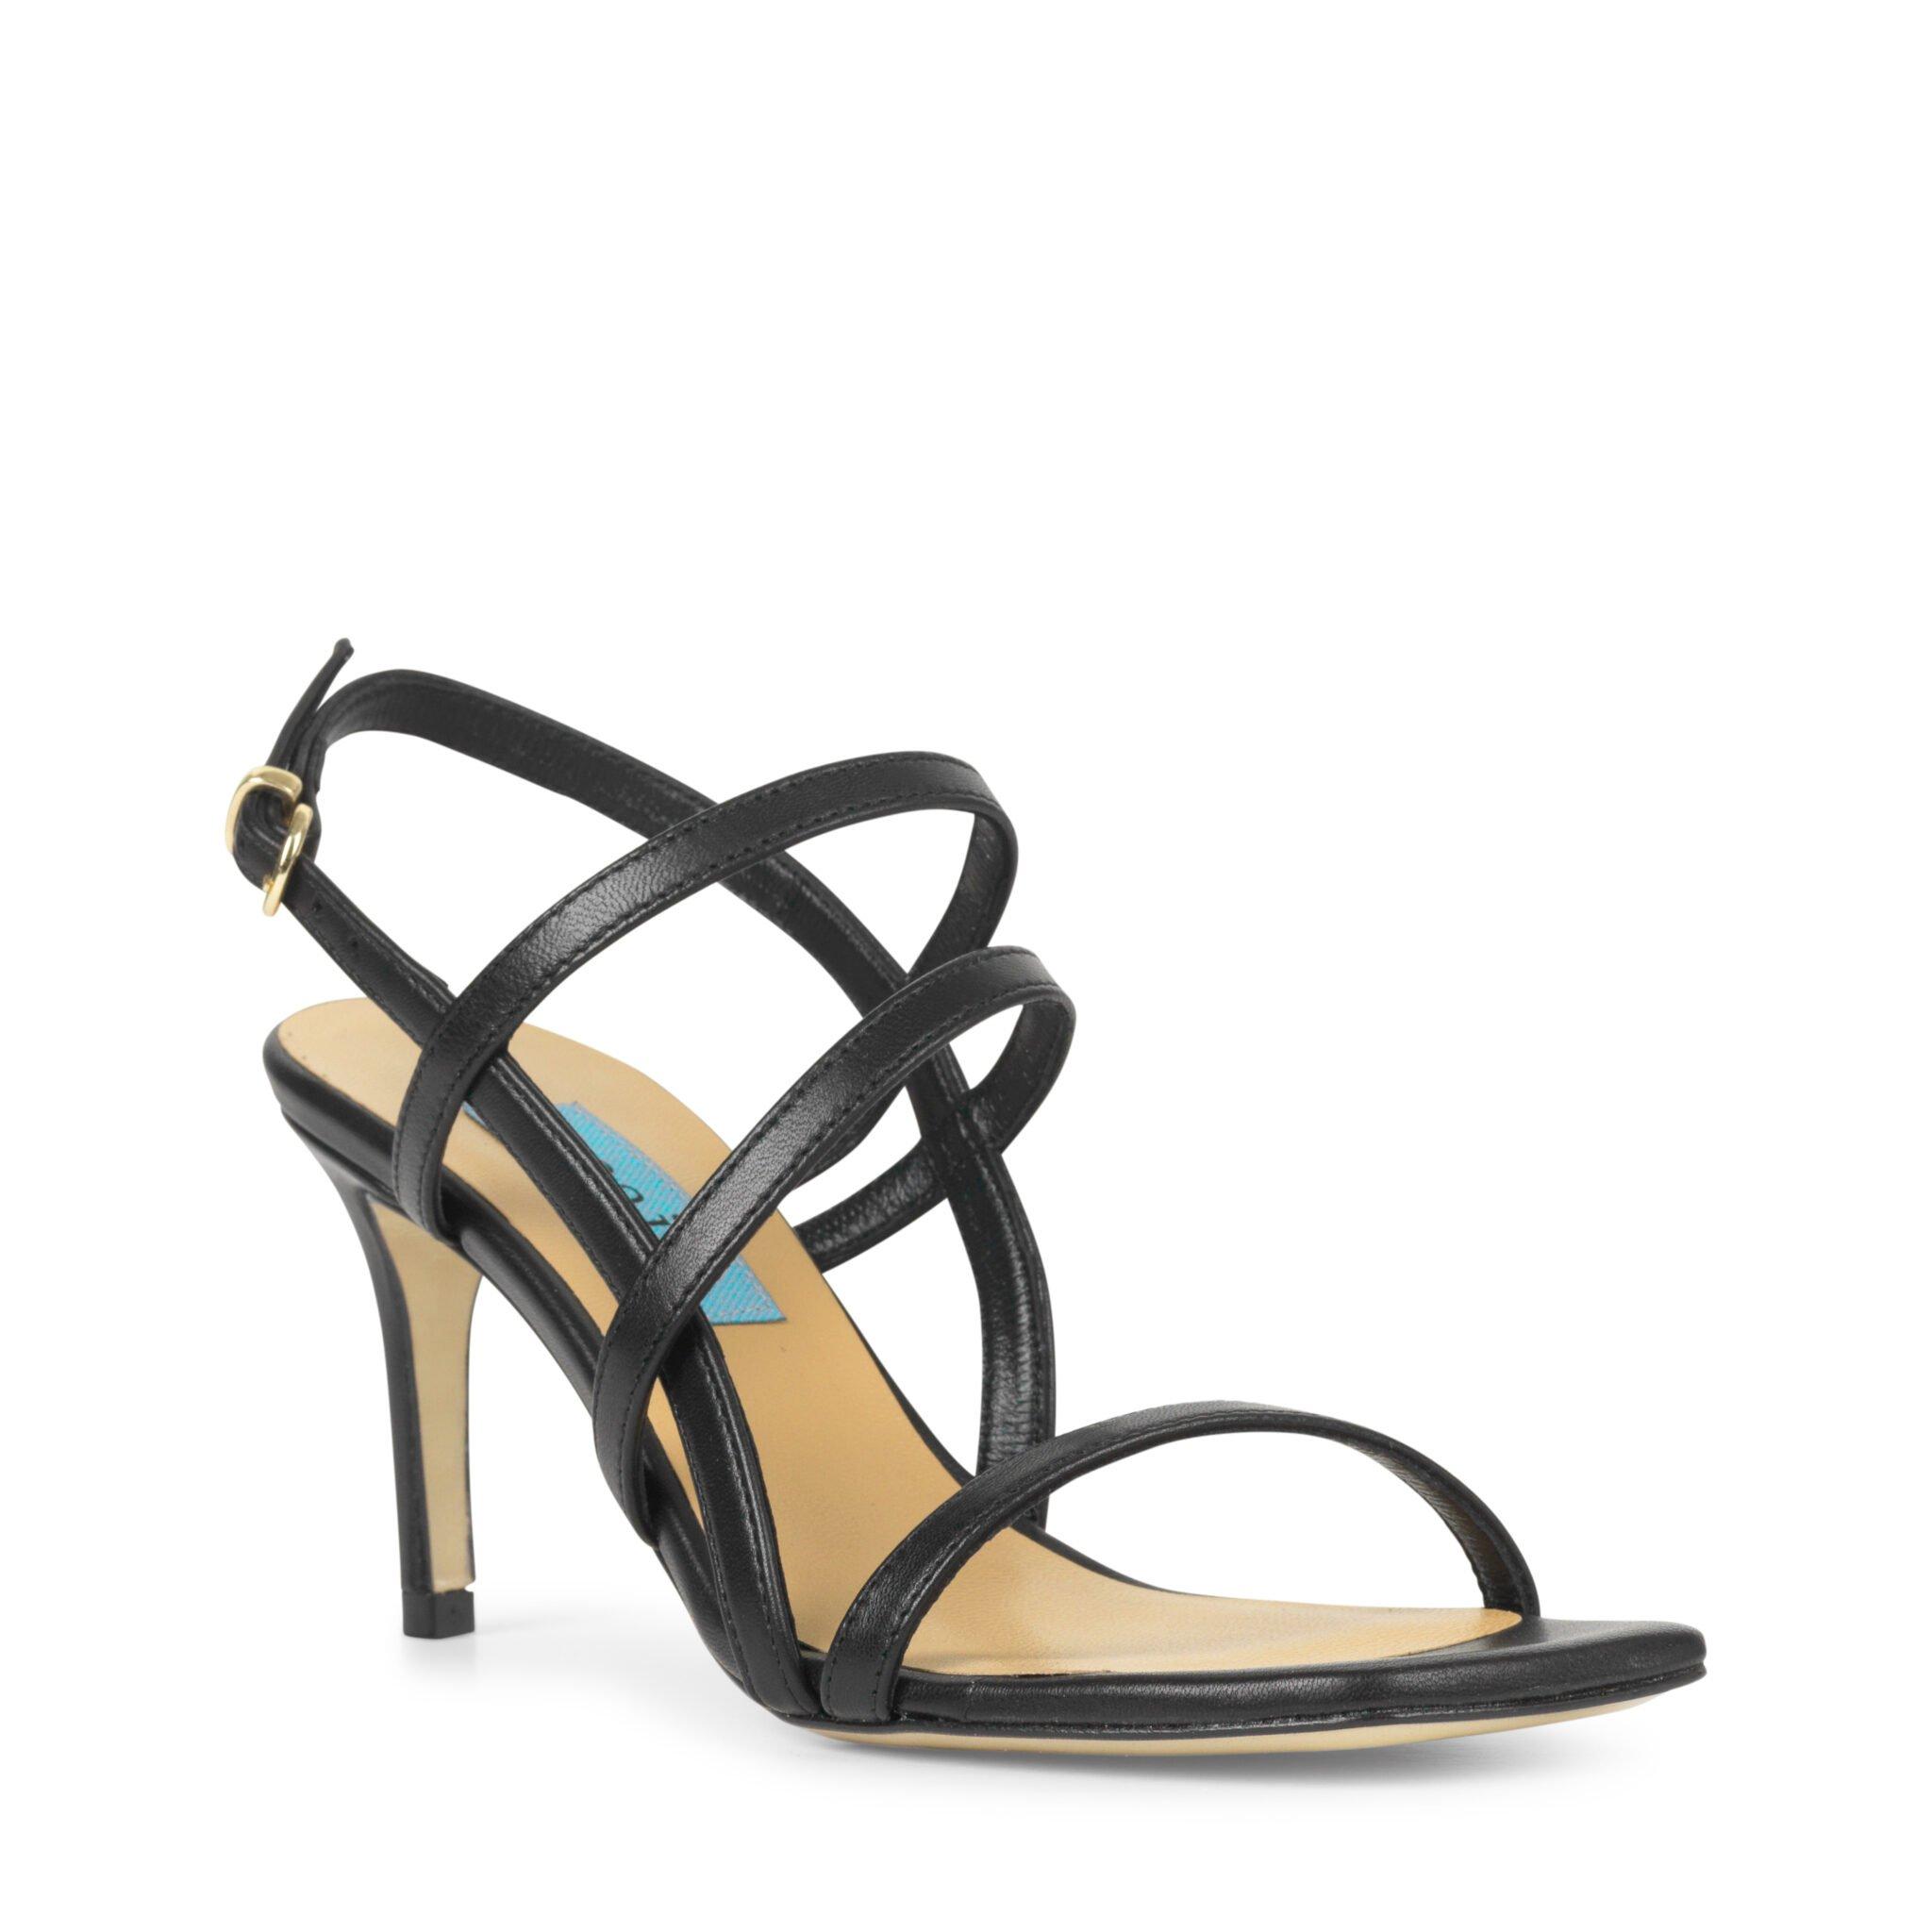 Apair Heeled Sandal Parma Nero